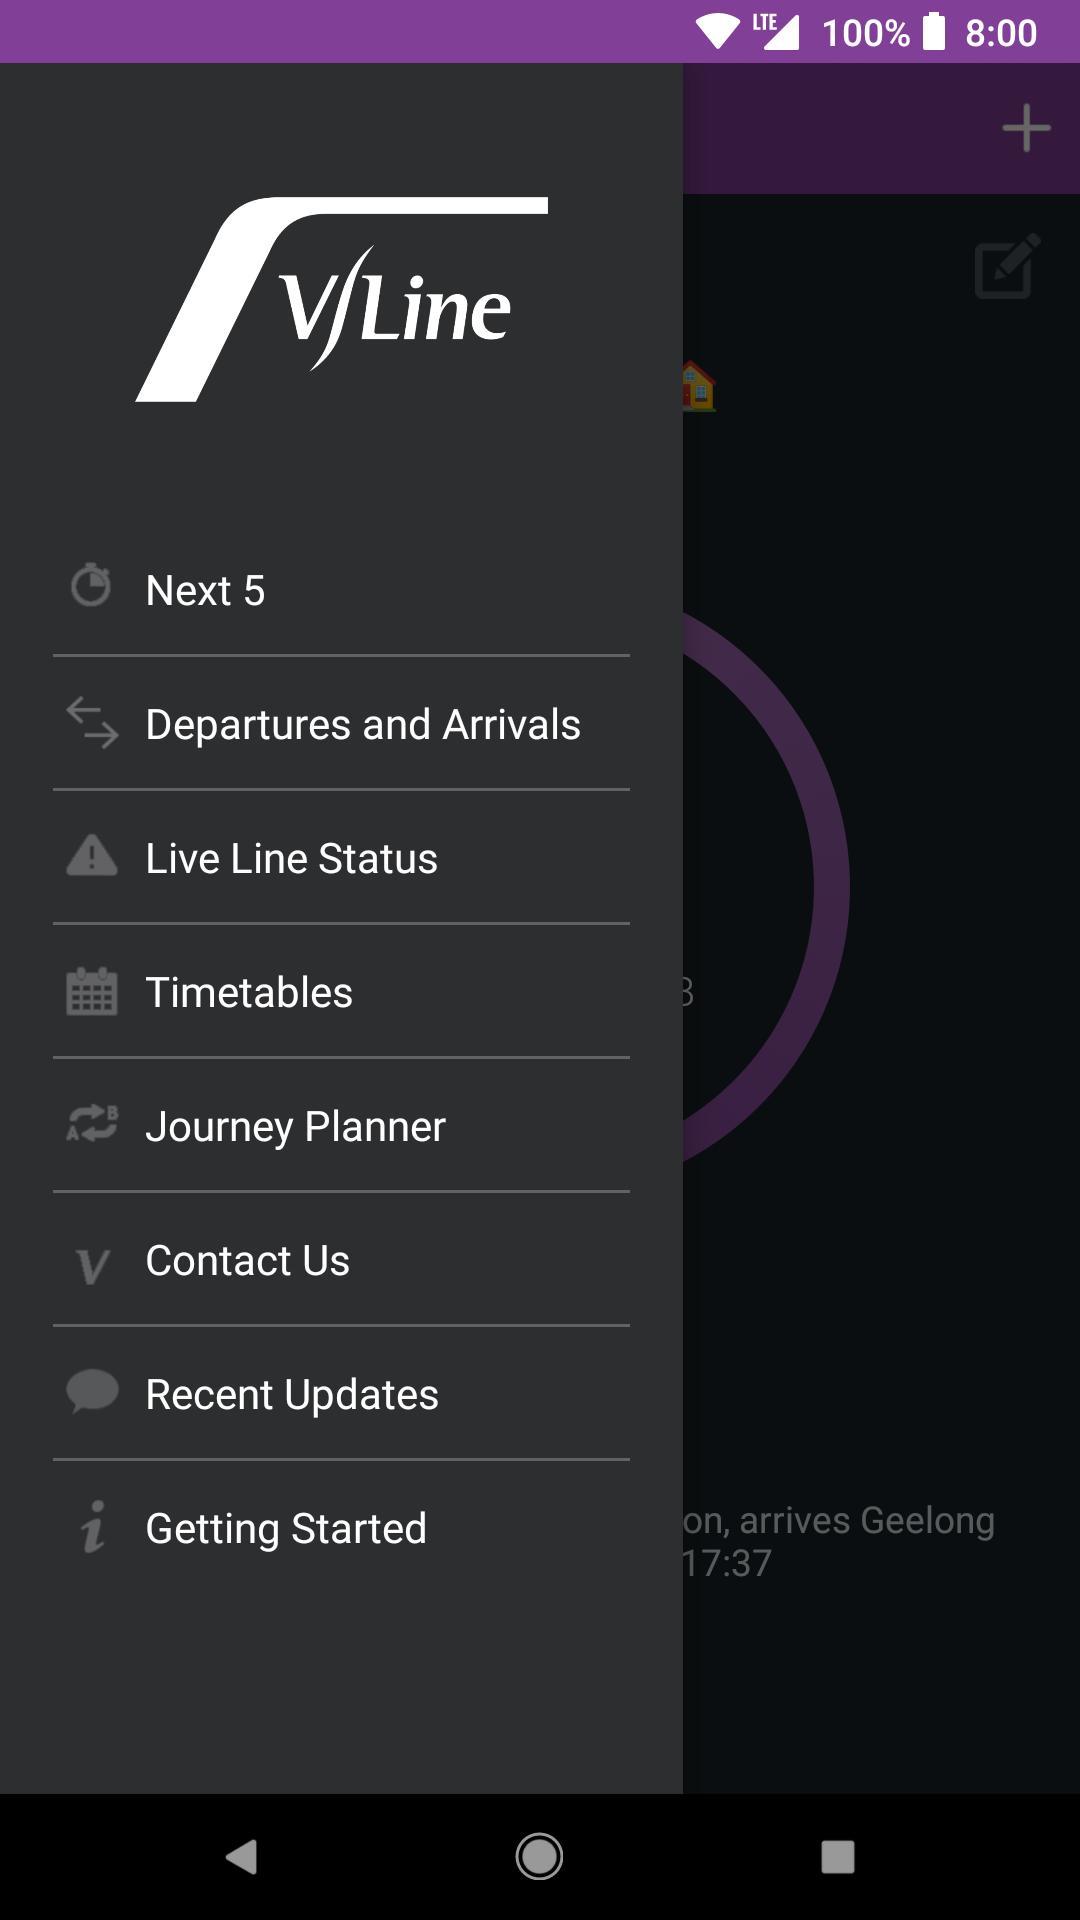 V/Line for Android - APK Download